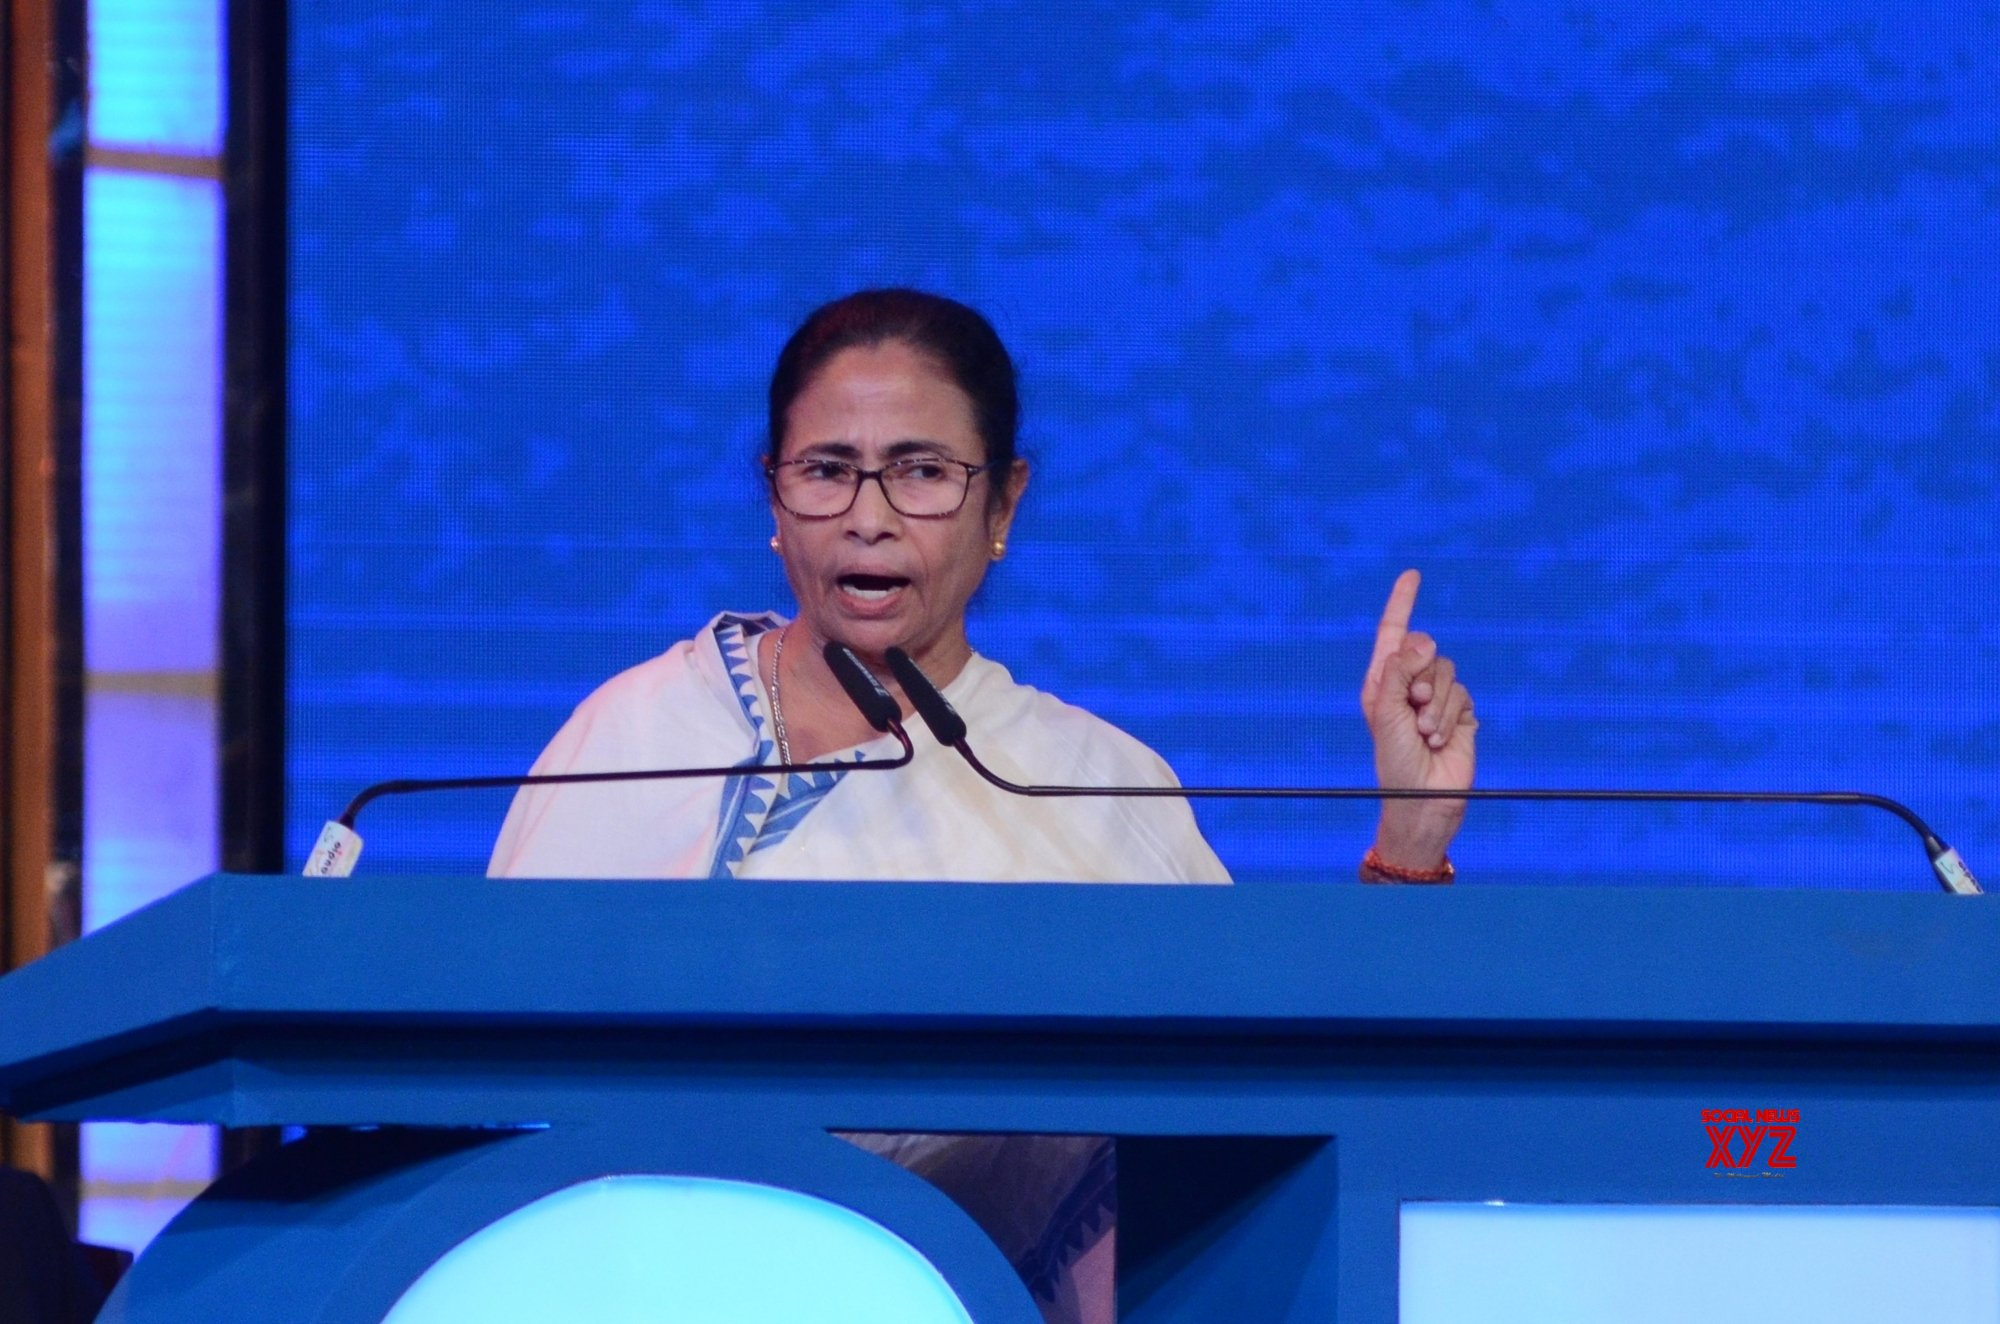 BJP attempting religious conversion: Mamata